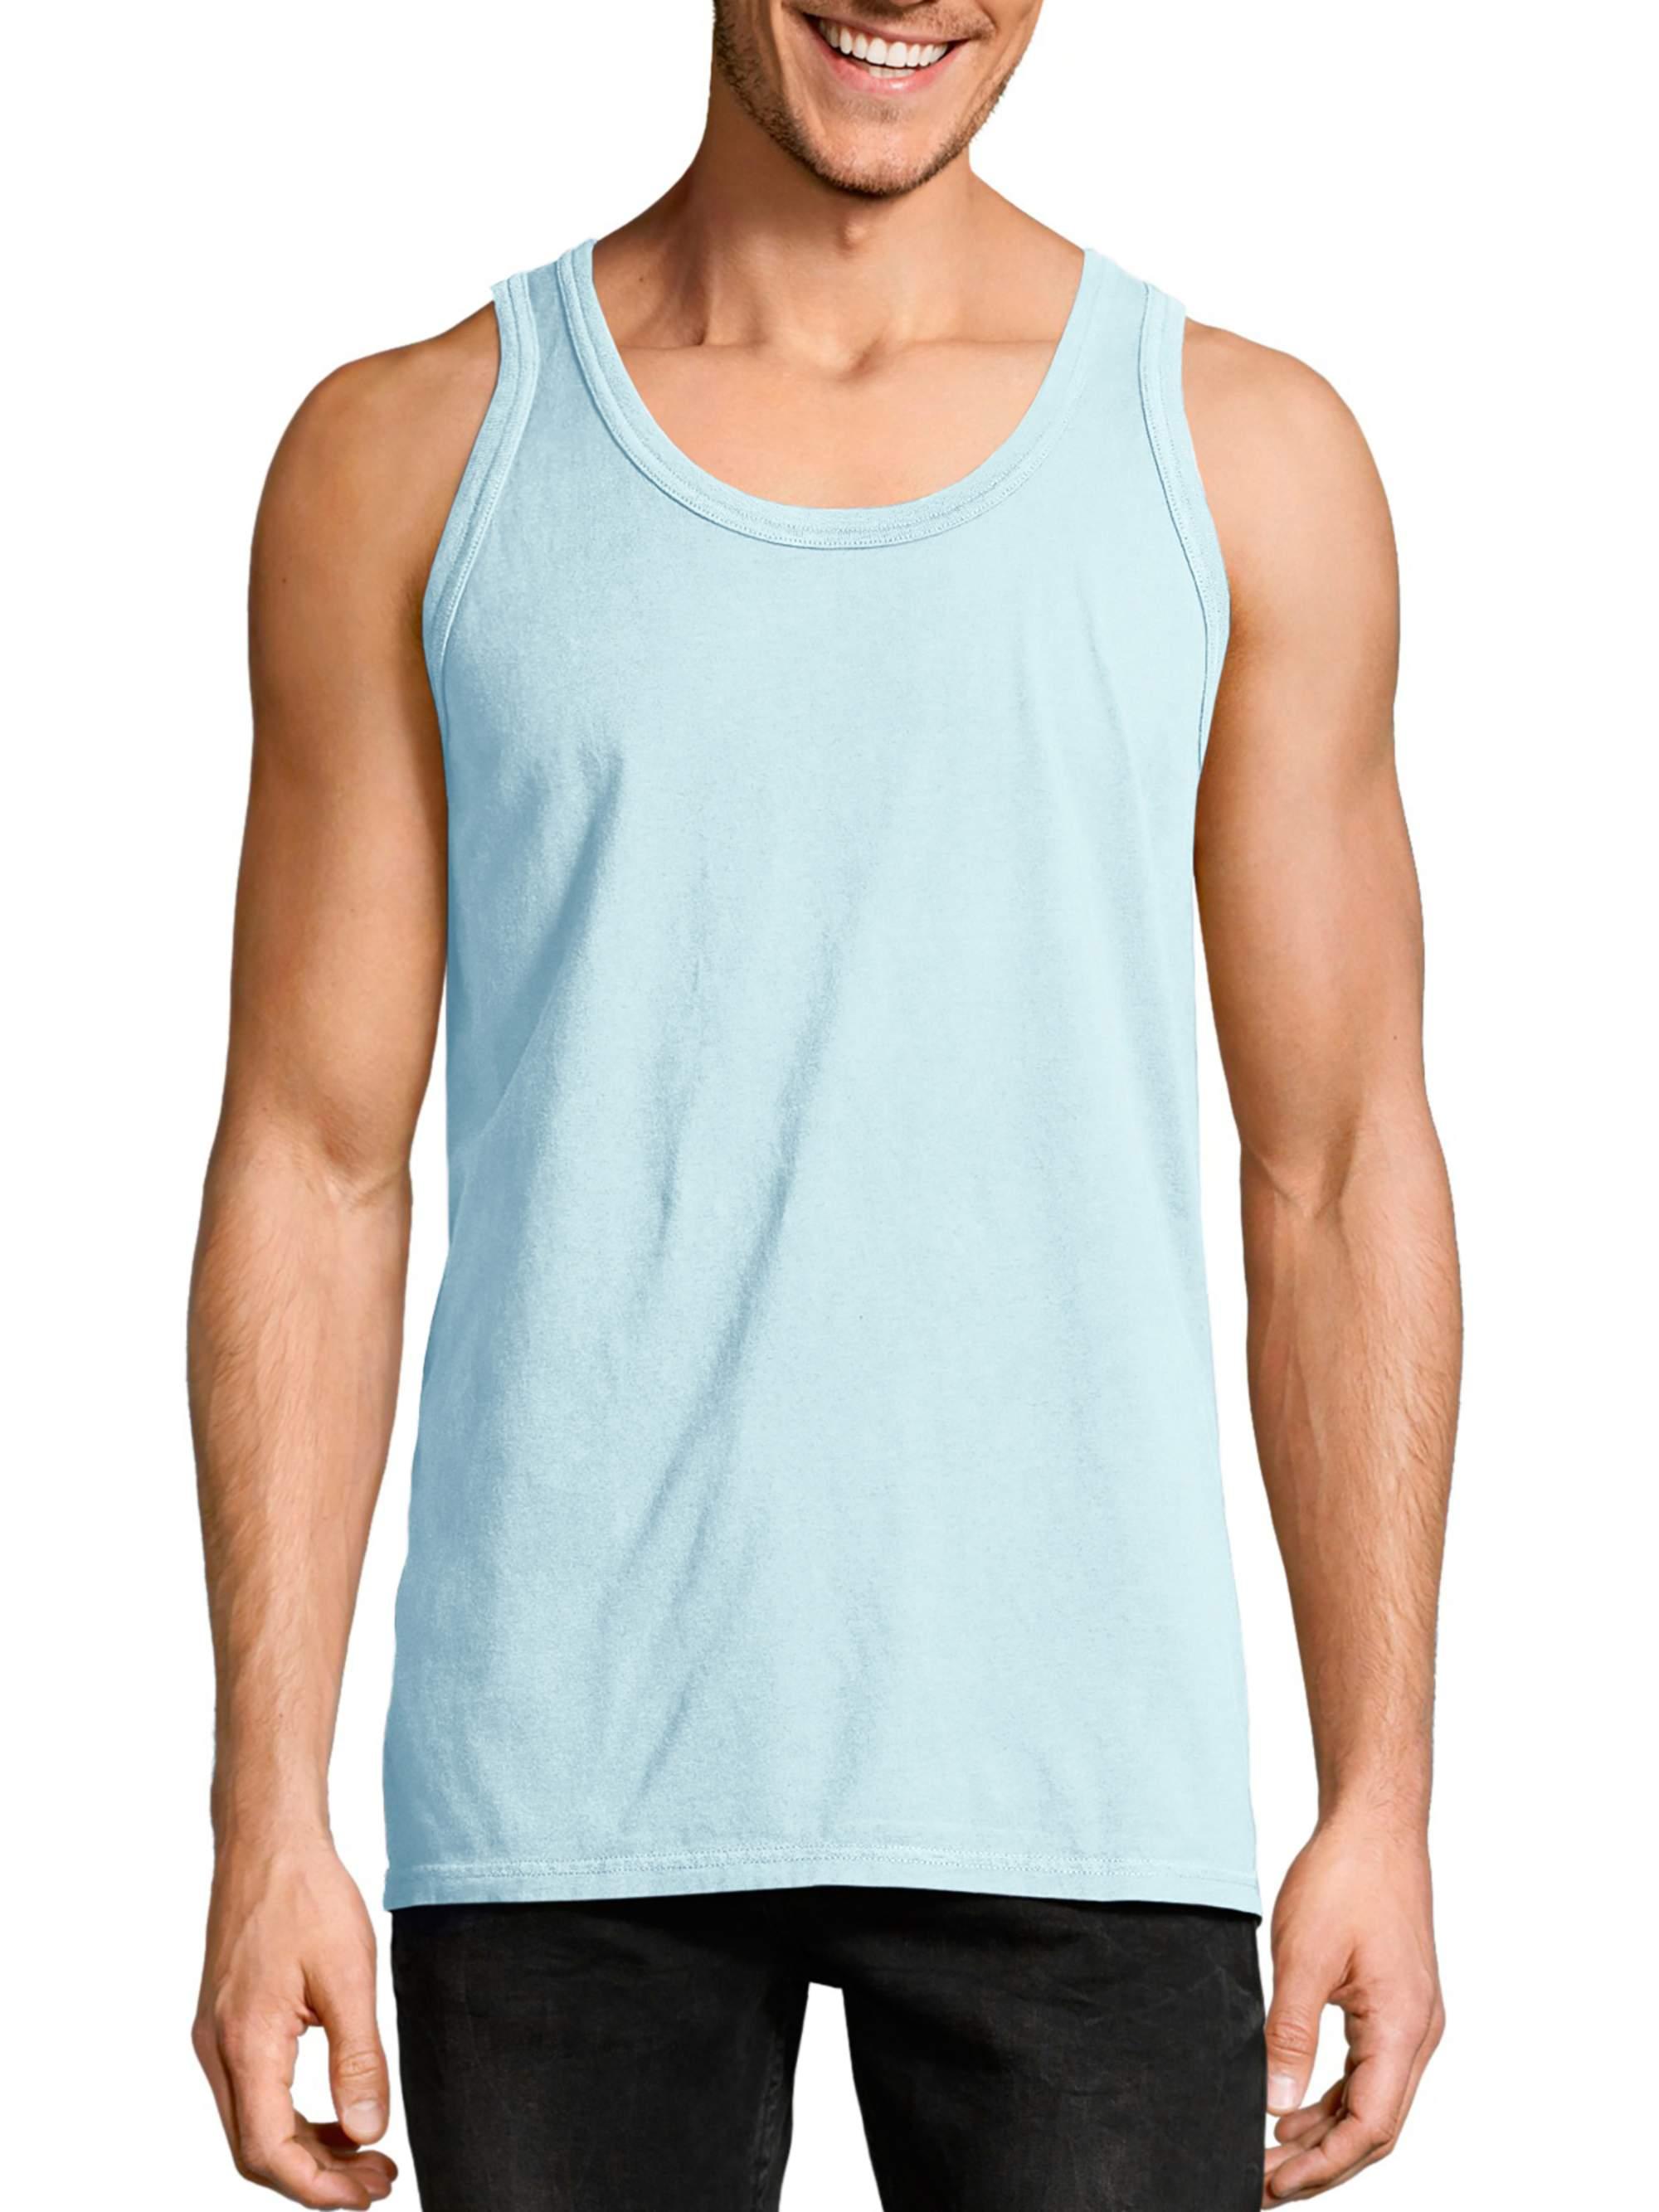 Men's ComfortWash Garment Dyed Sleeveless Tank Top